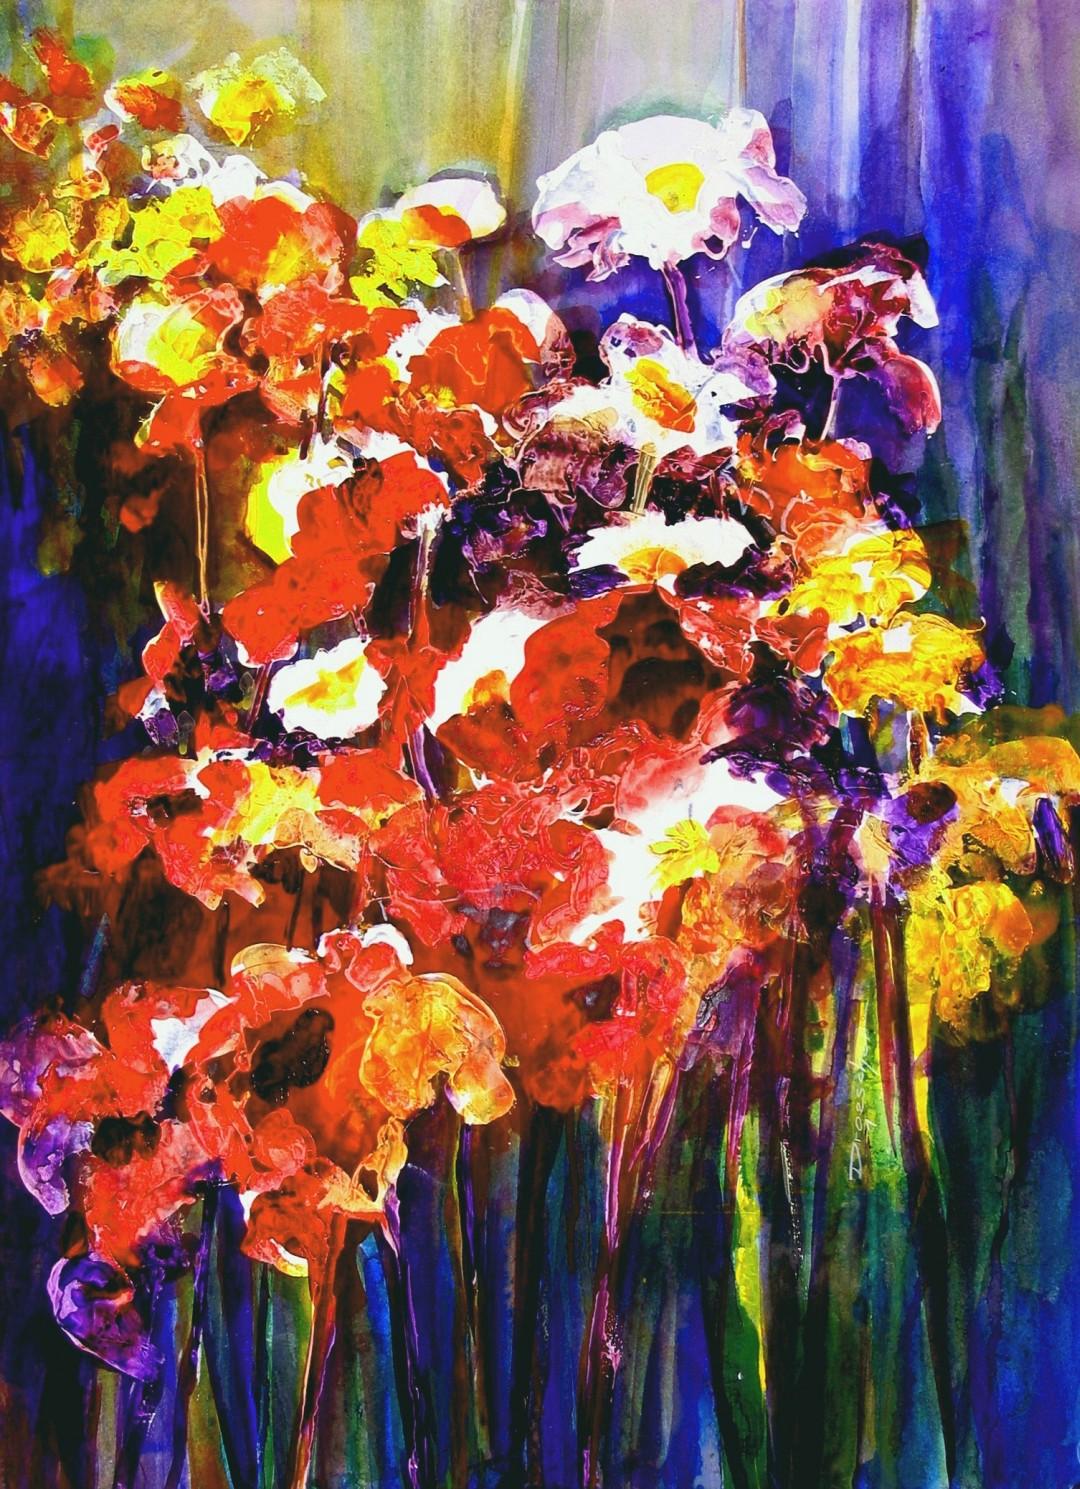 41 Blumenbeet 63x48.JPG